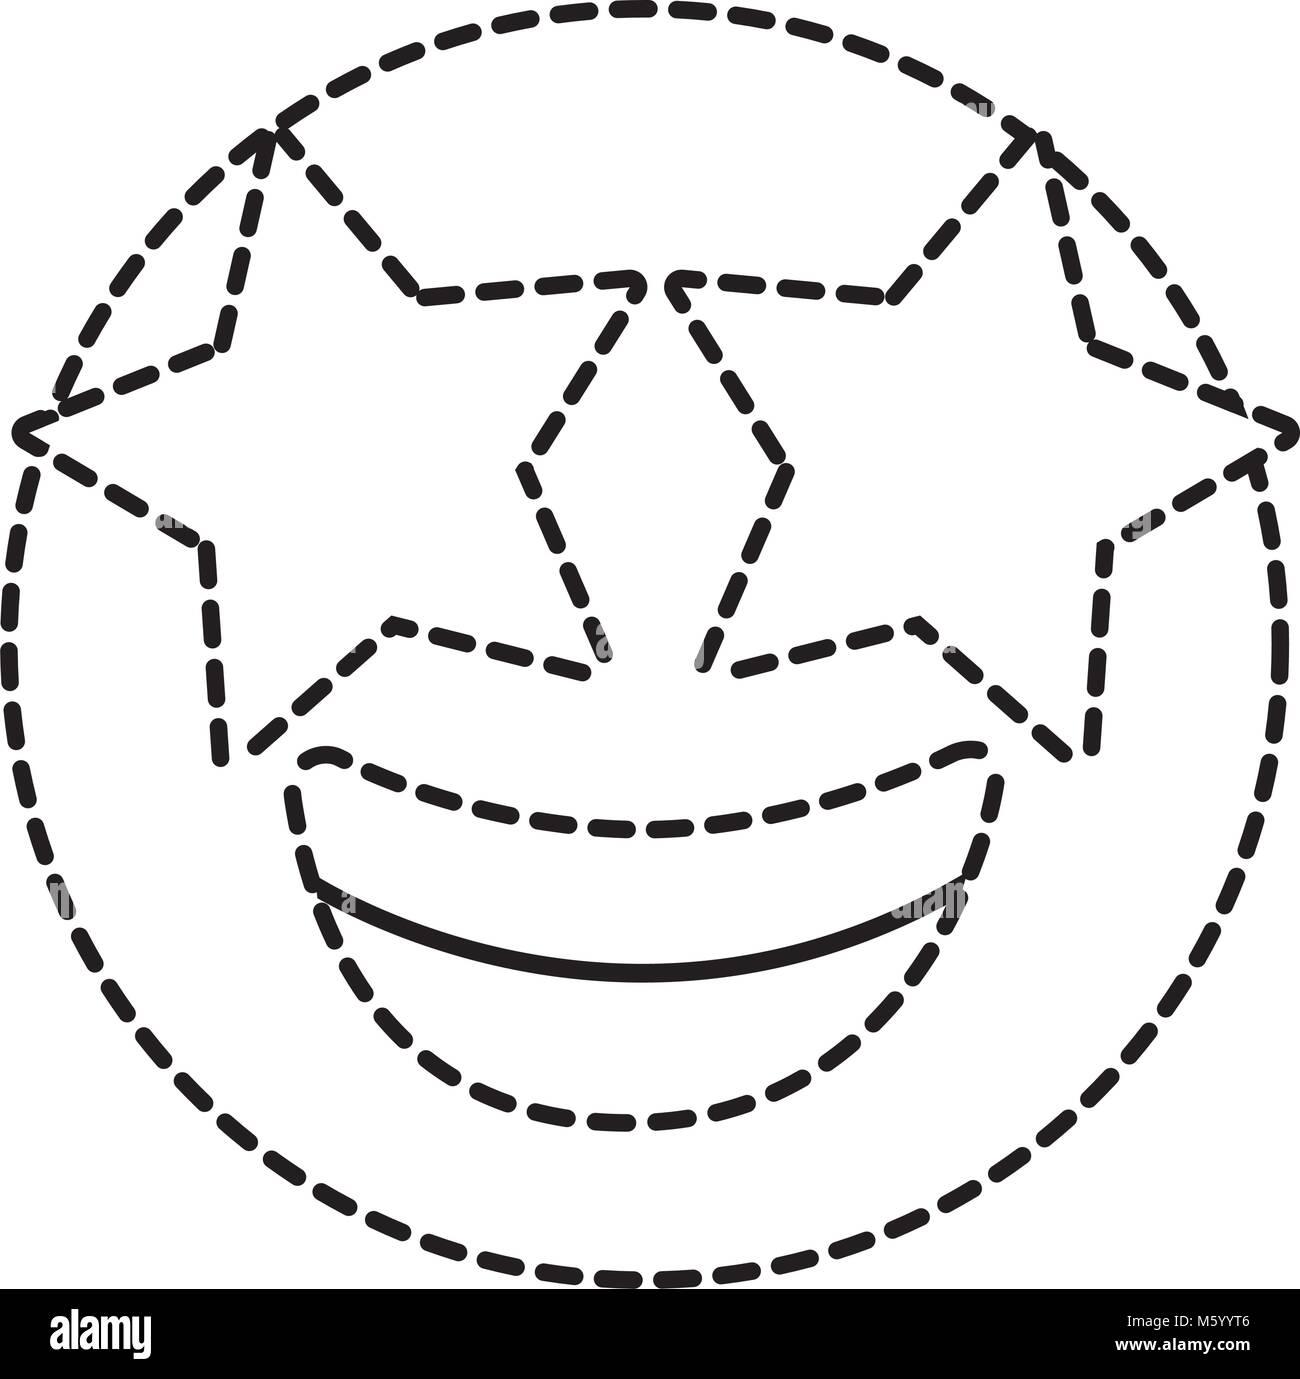 Cartoon Star Emoji Emoticon Character Black and White Stock